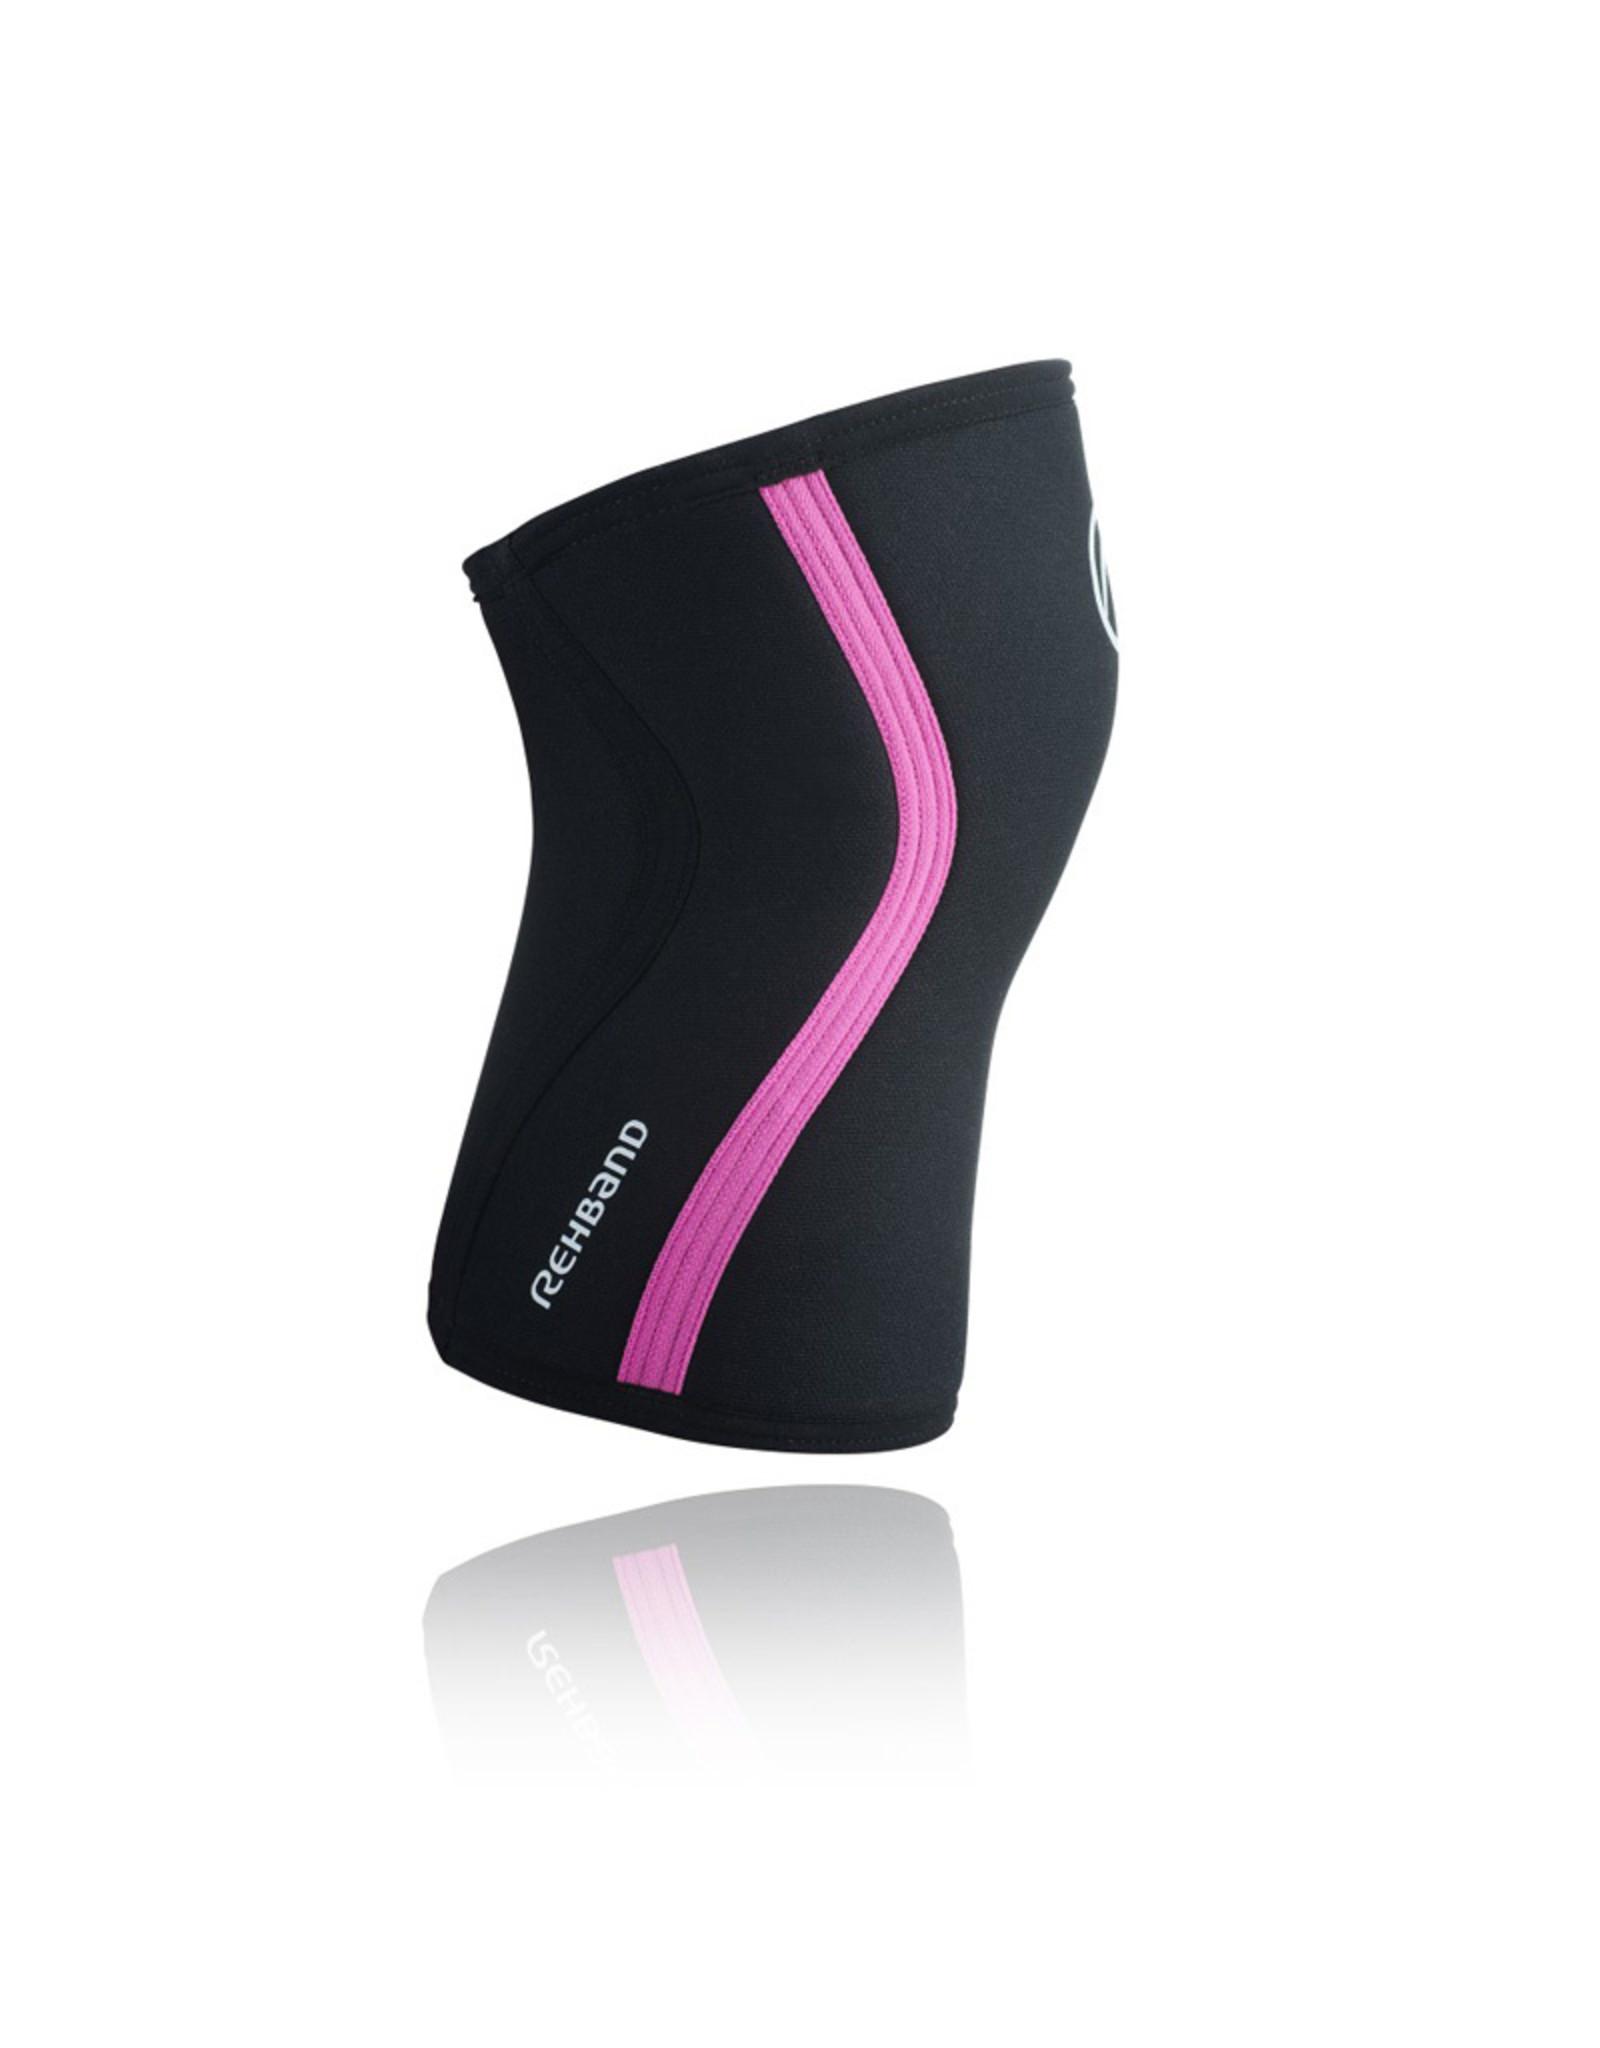 Rehband Rx Knee Sleeve 7Mm Kniebrace - Zwart/Roze